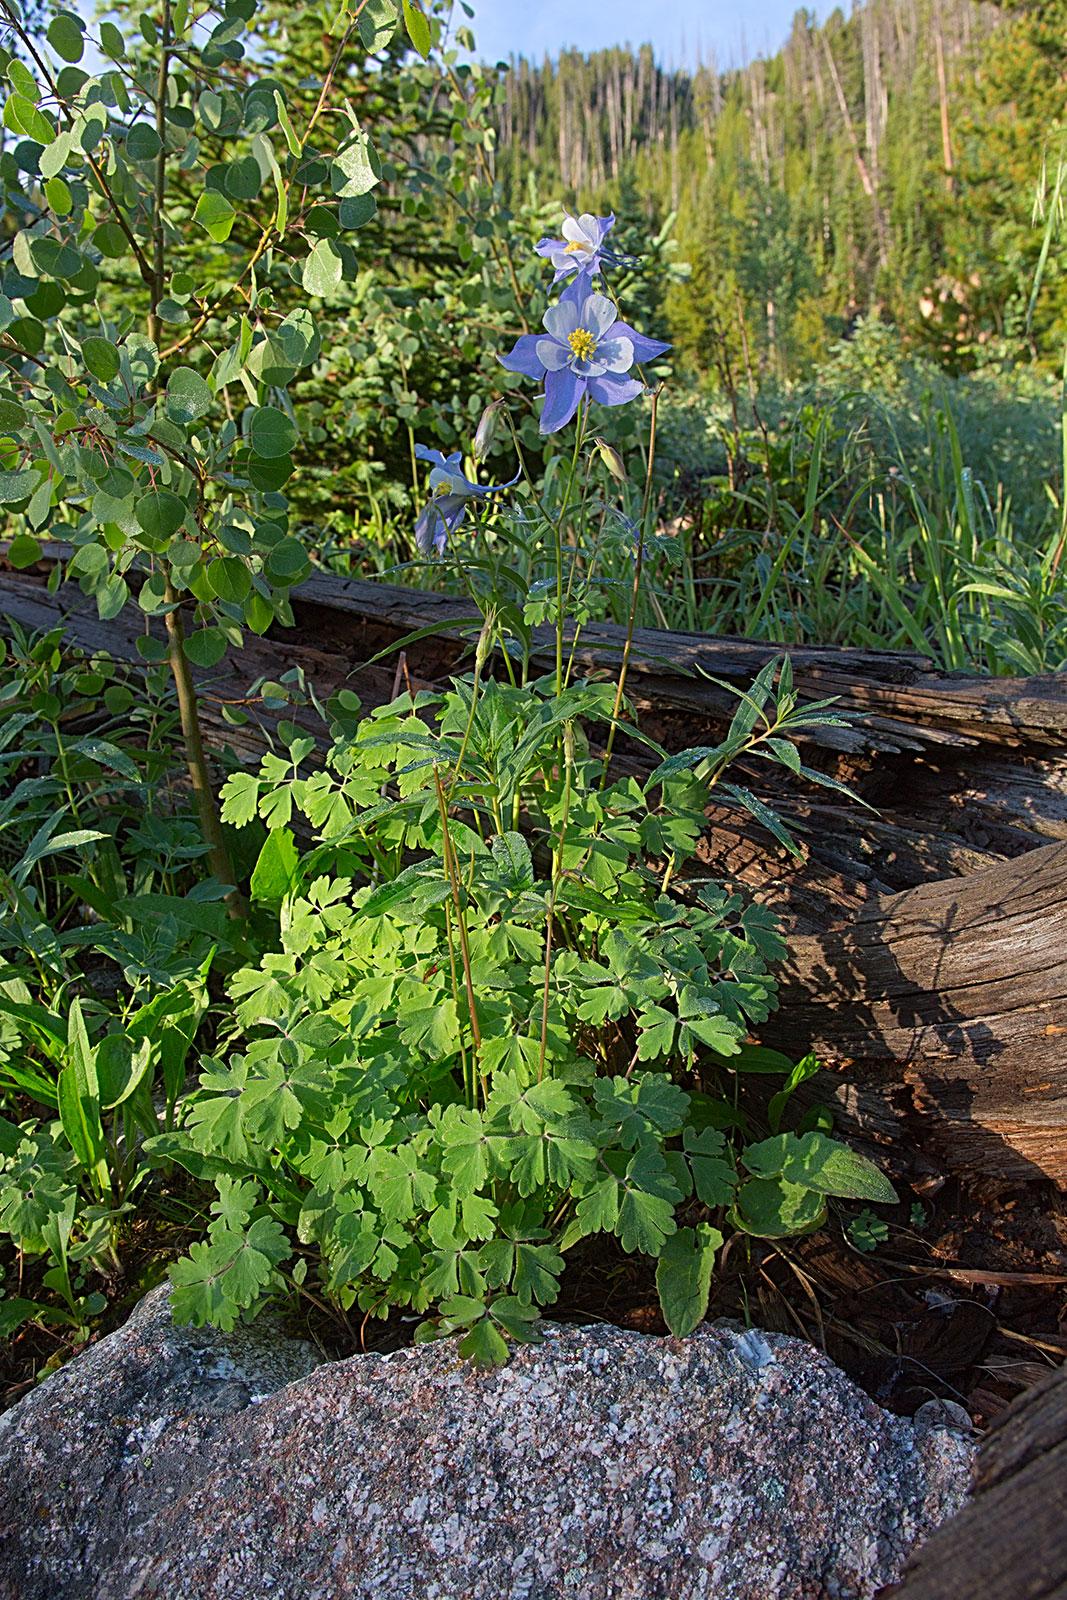 Blue Columbine,  Aquilegia caerulea  , state flower of Colorado.